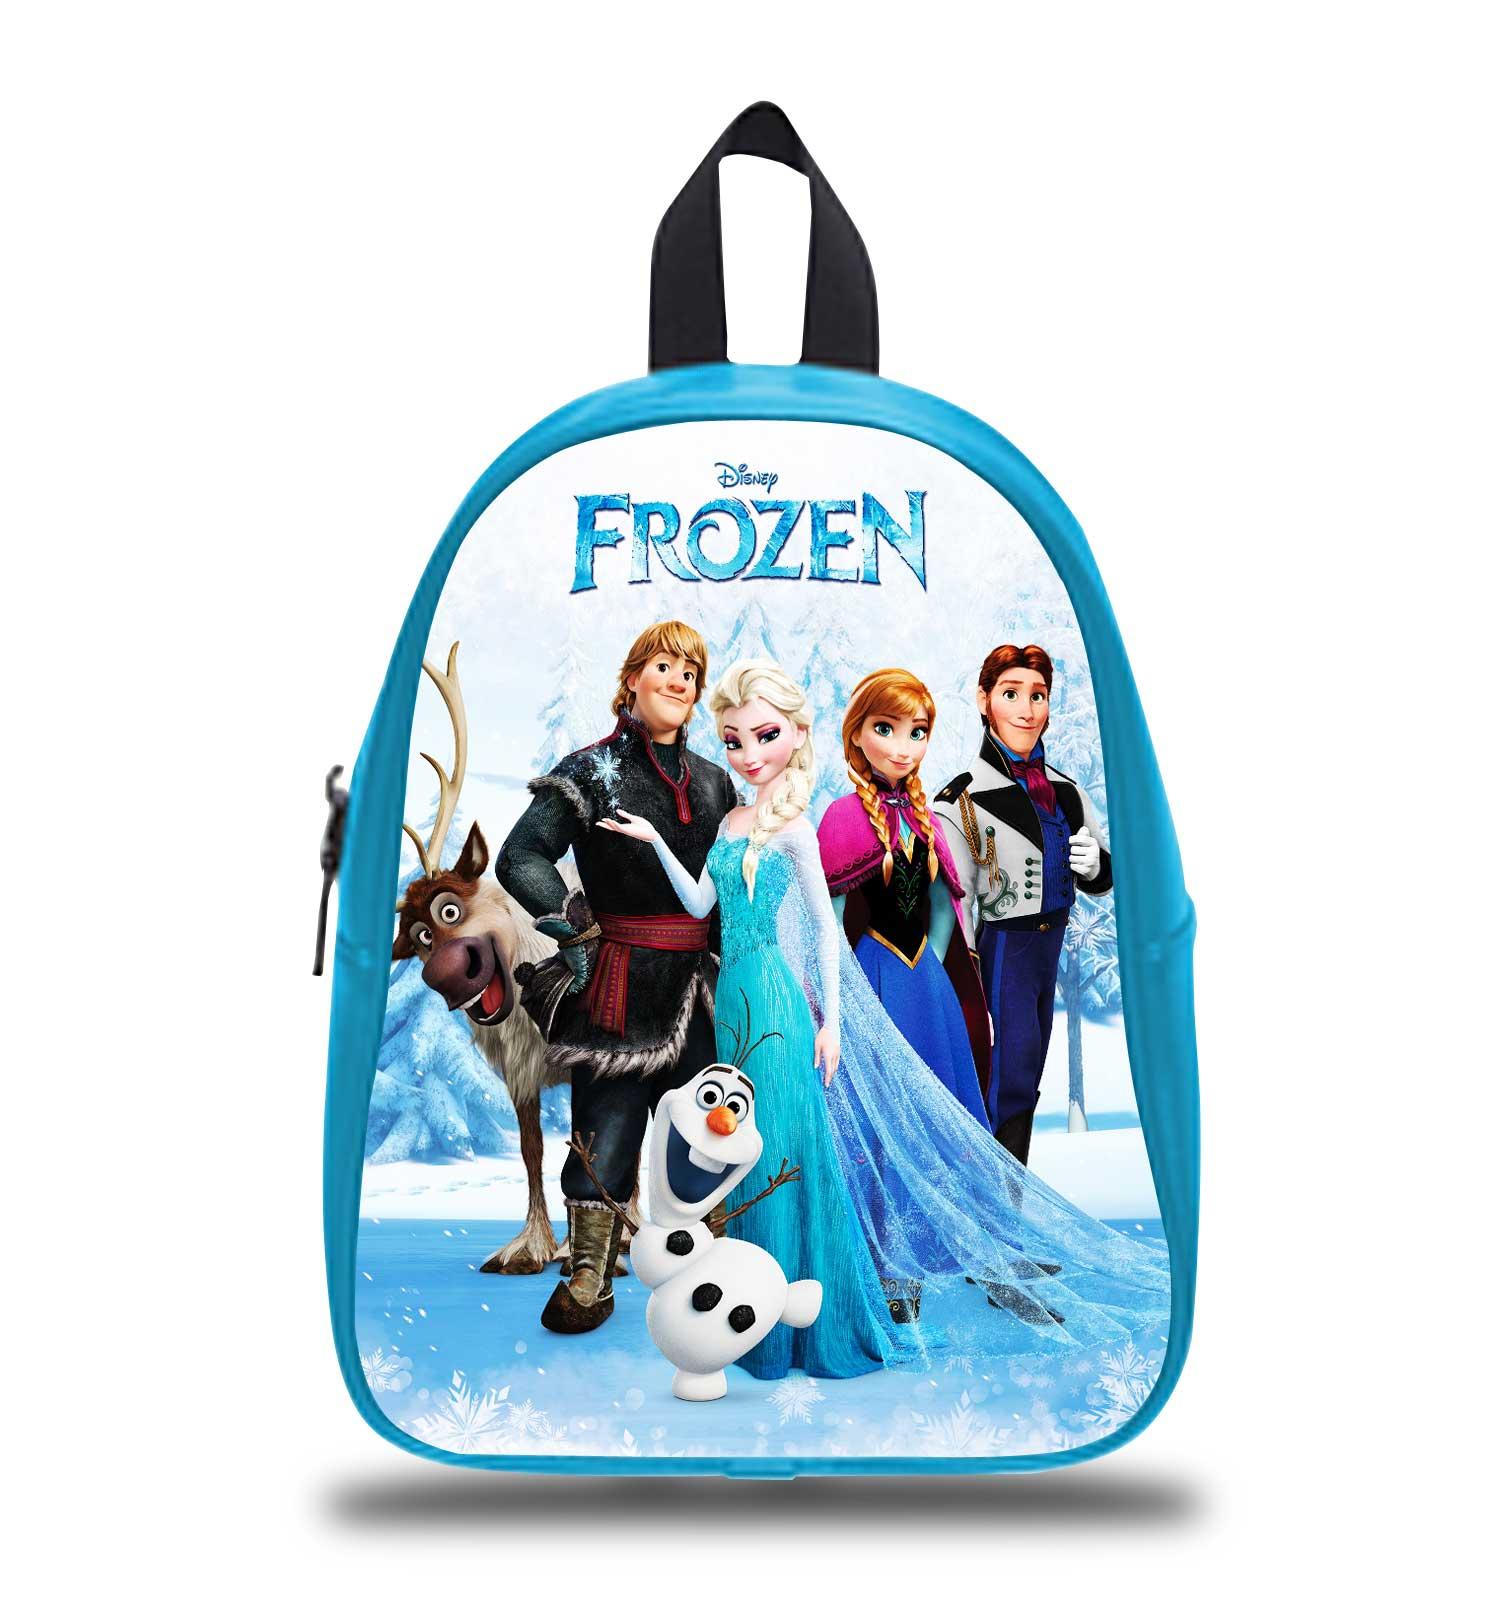 cca8c9e45e2 Disney Frozen all Character Elsa Anna Olaf Kristoff Schoolbag    Backpack    S M L   Kids